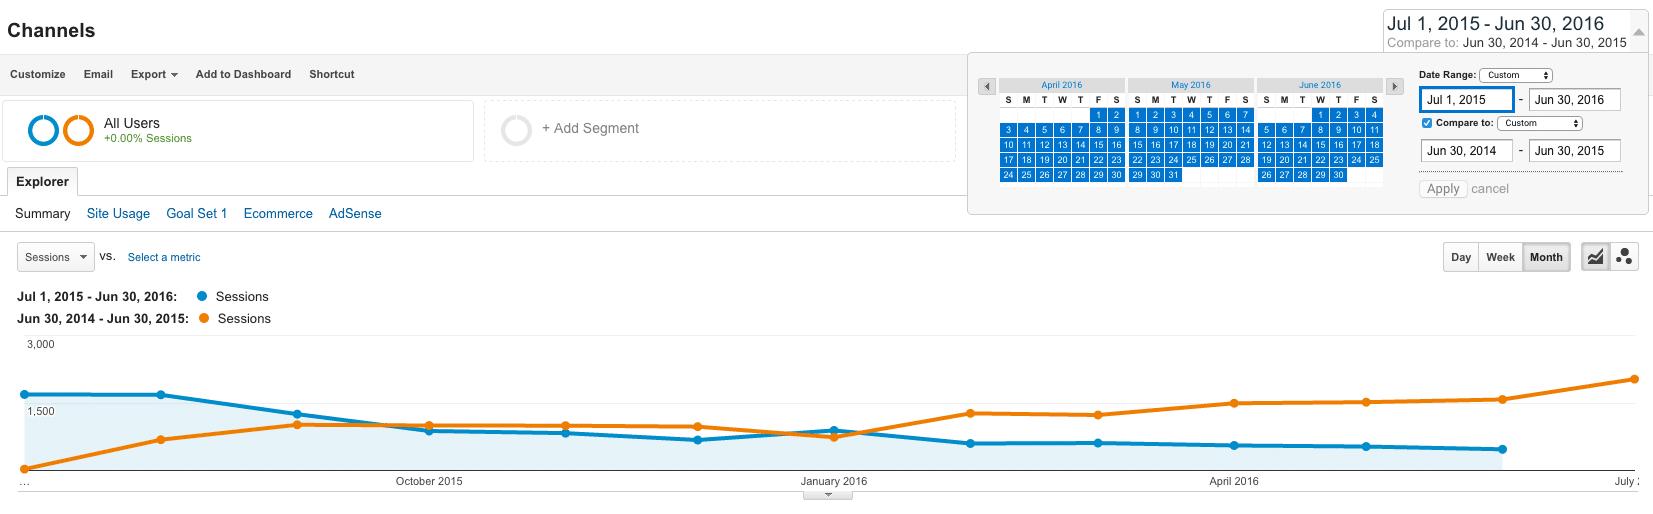 Content-Marketing Analytics Comparison